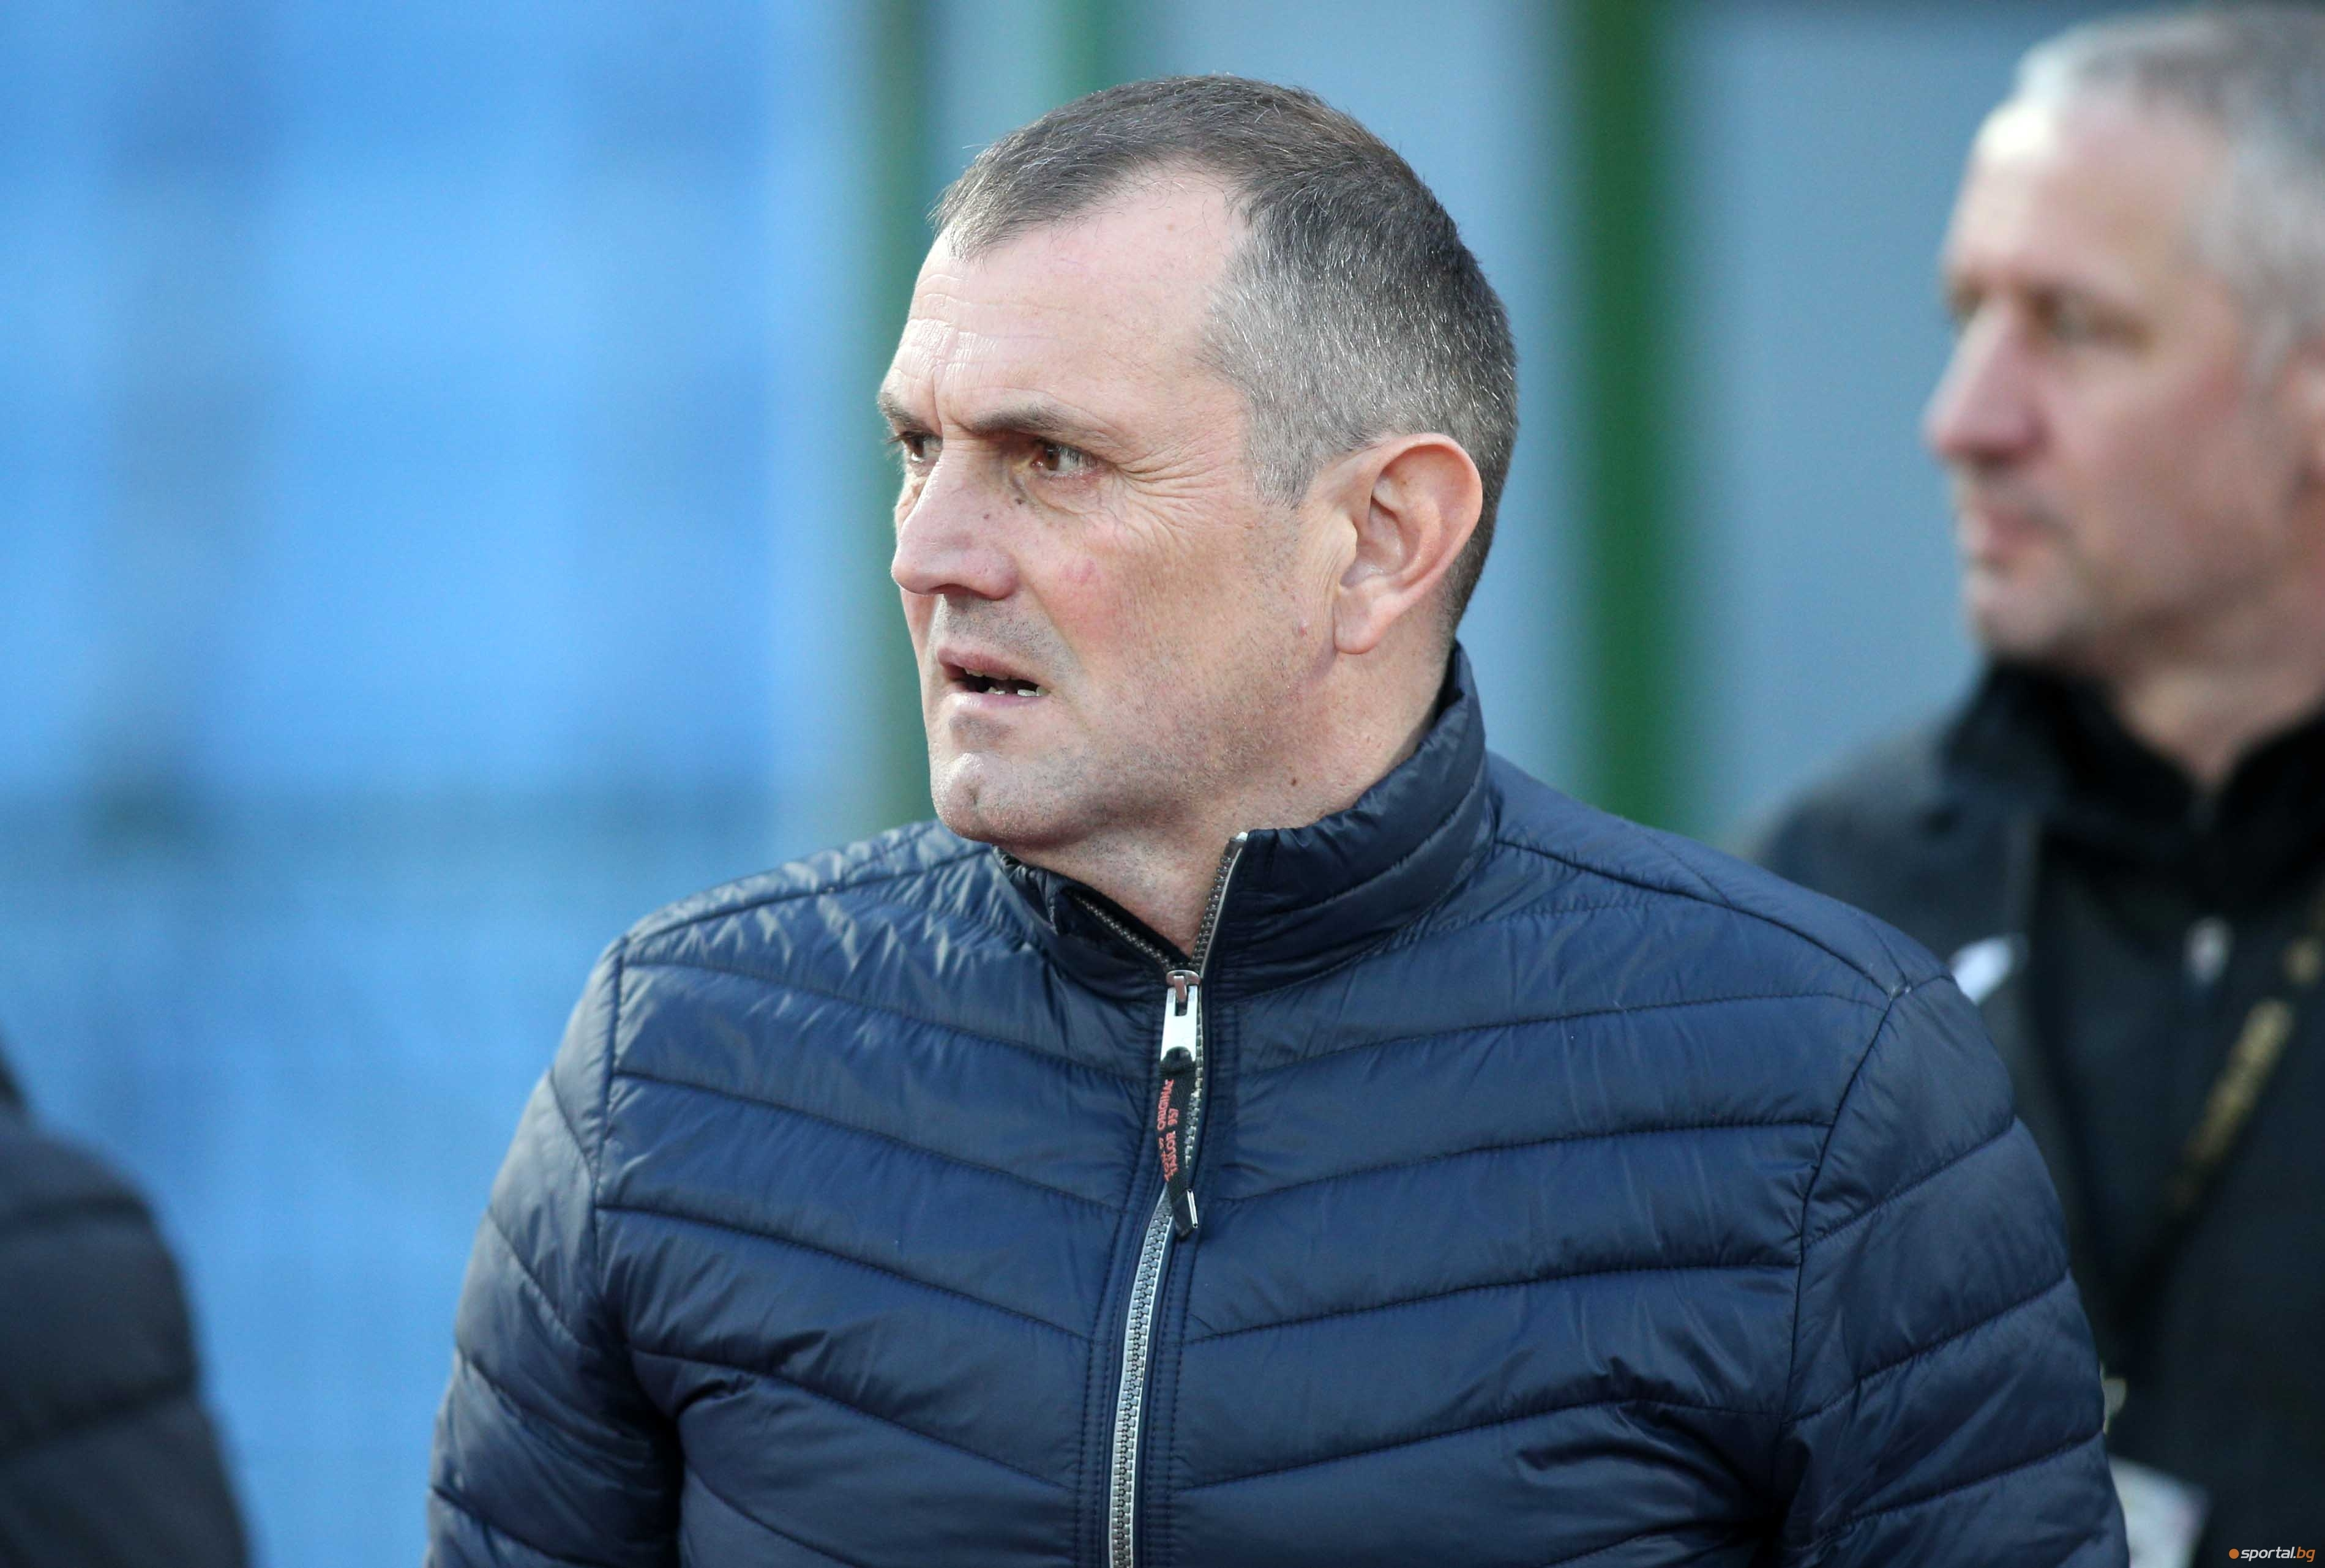 Старши треньорът на Славия Златомир Загорчич определи групата на Славия